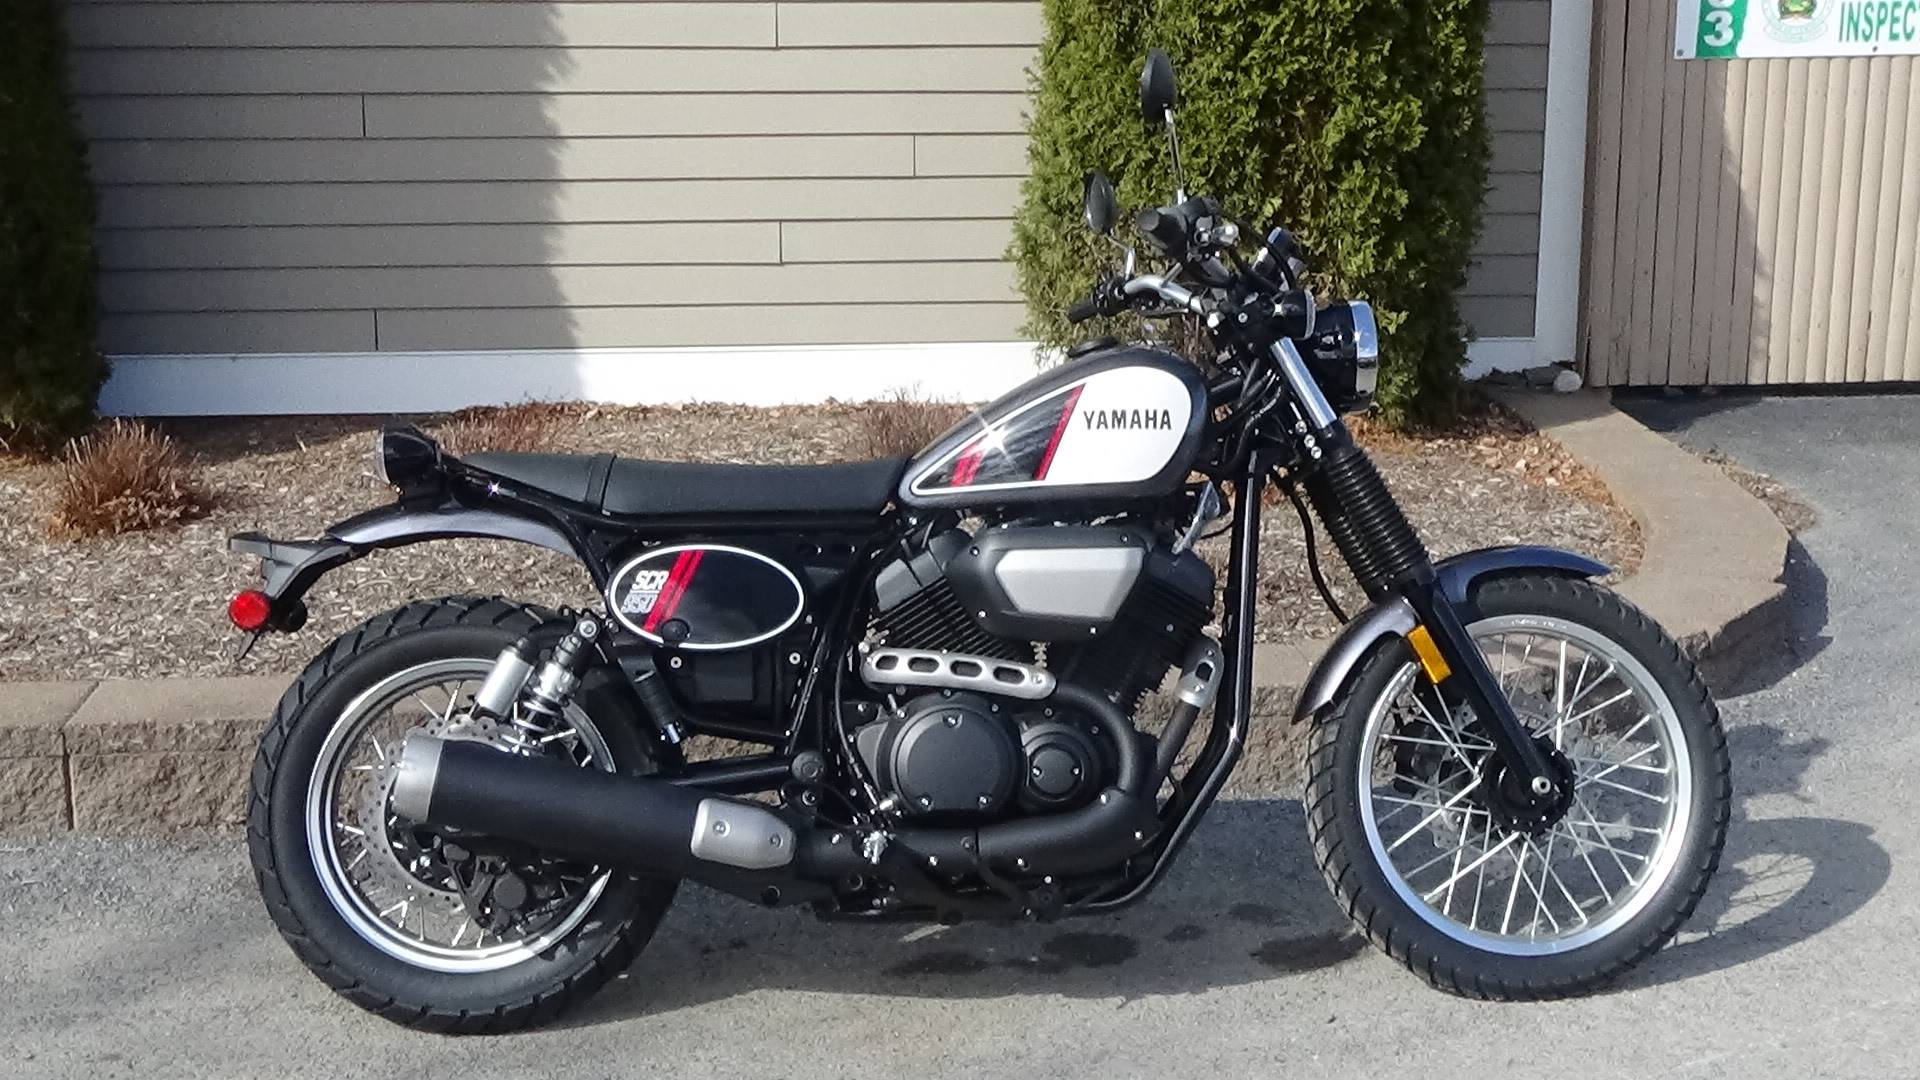 2017 Yamaha Scr950 In Bennington Vermont